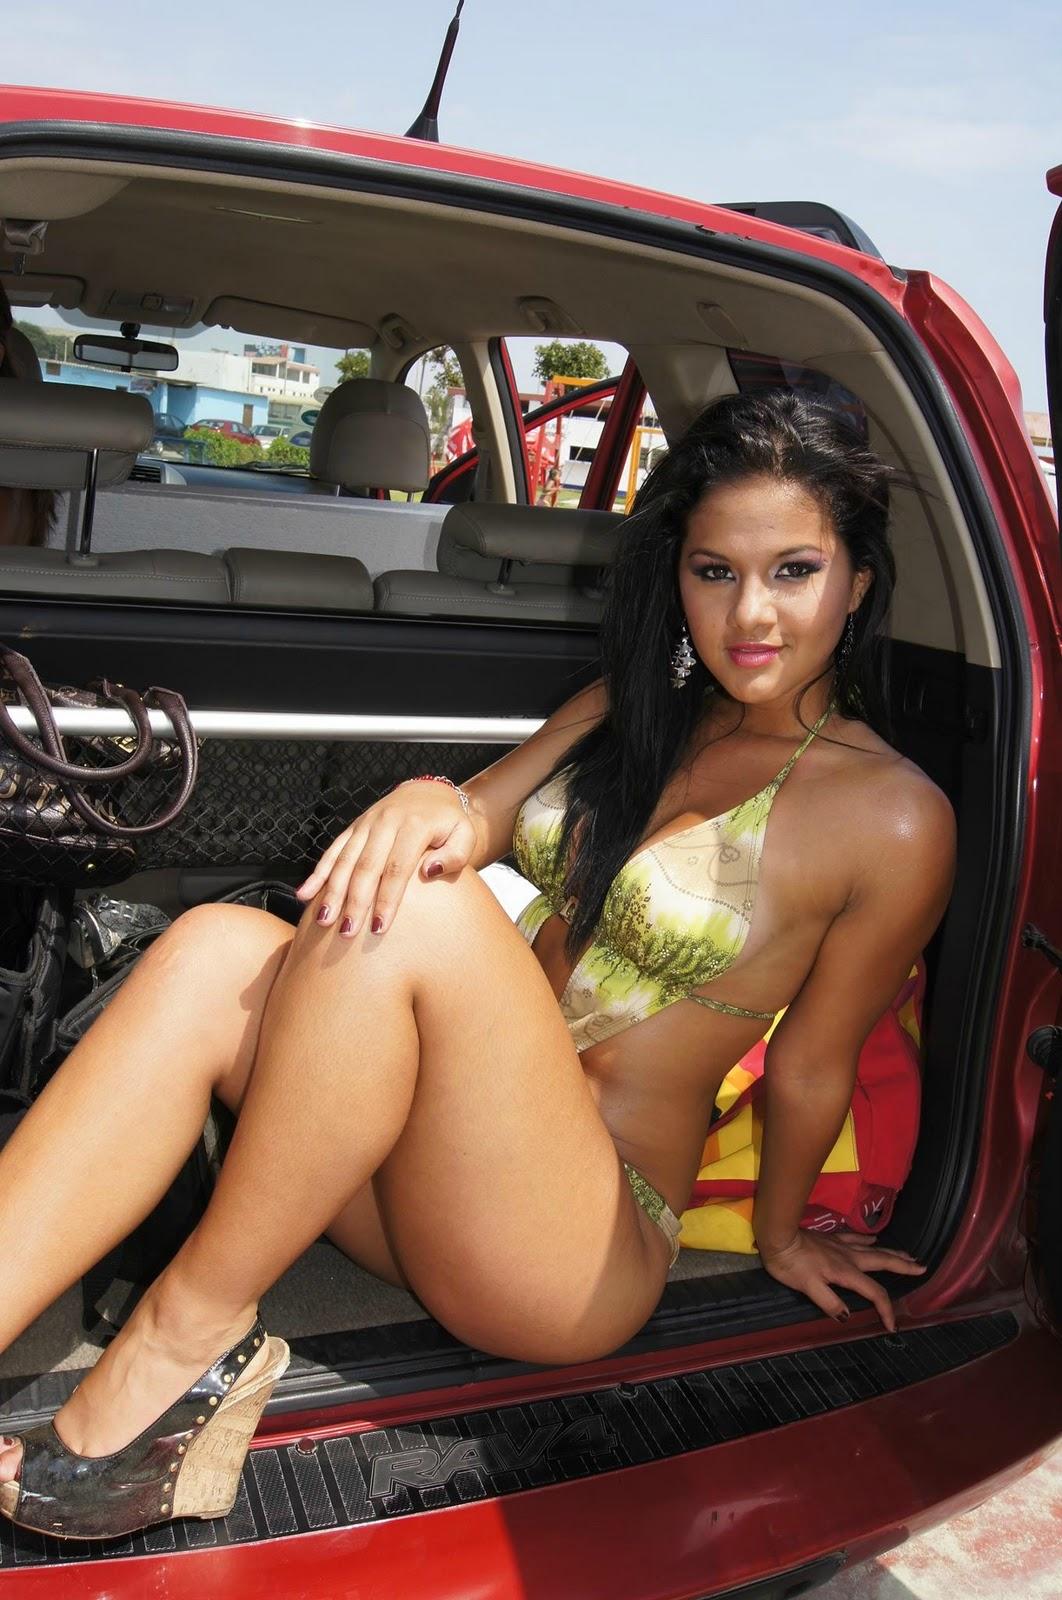 Yolanda Medina Katty Garcia Geraldine Ginocchio Emily Vargas Annabel